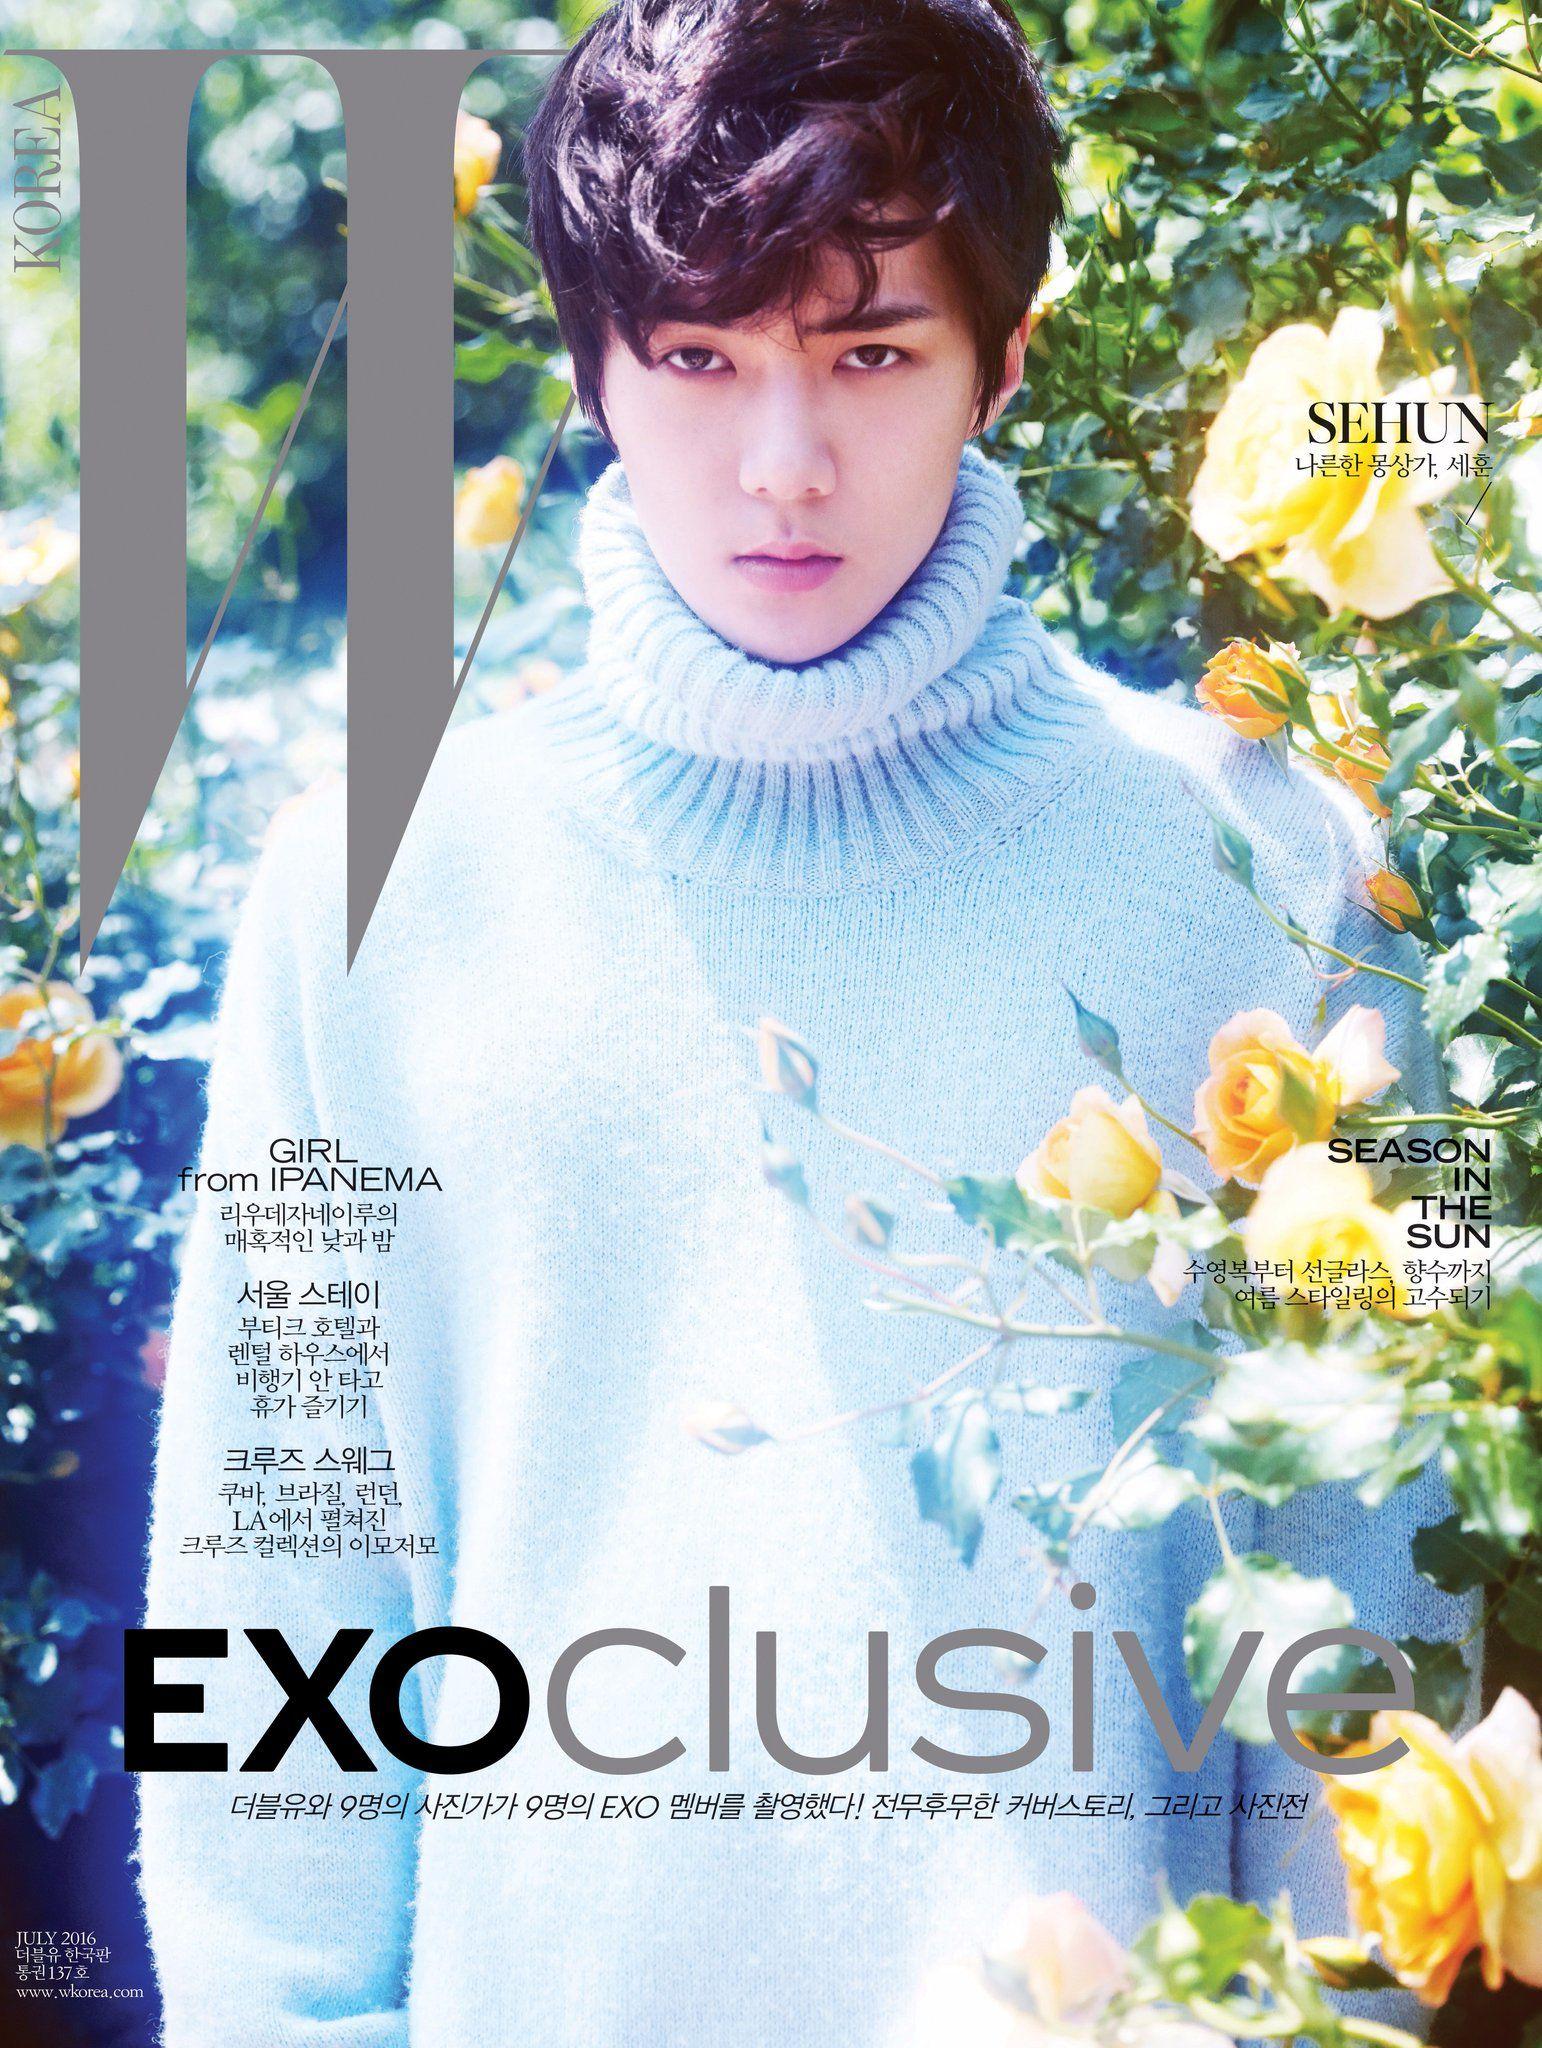 "W Korea on Twitter: ""#EXOclusive Cover 3 #SEHUN <W Korea>와 SM엔터테인먼트의 독점 콜라보레이션 프로젝트, #EXO 멤버 9종 커버 공개! 자세한 정보는 https://t.co/XJCMXskAFK https://t.co/hKpblVpi2y"""